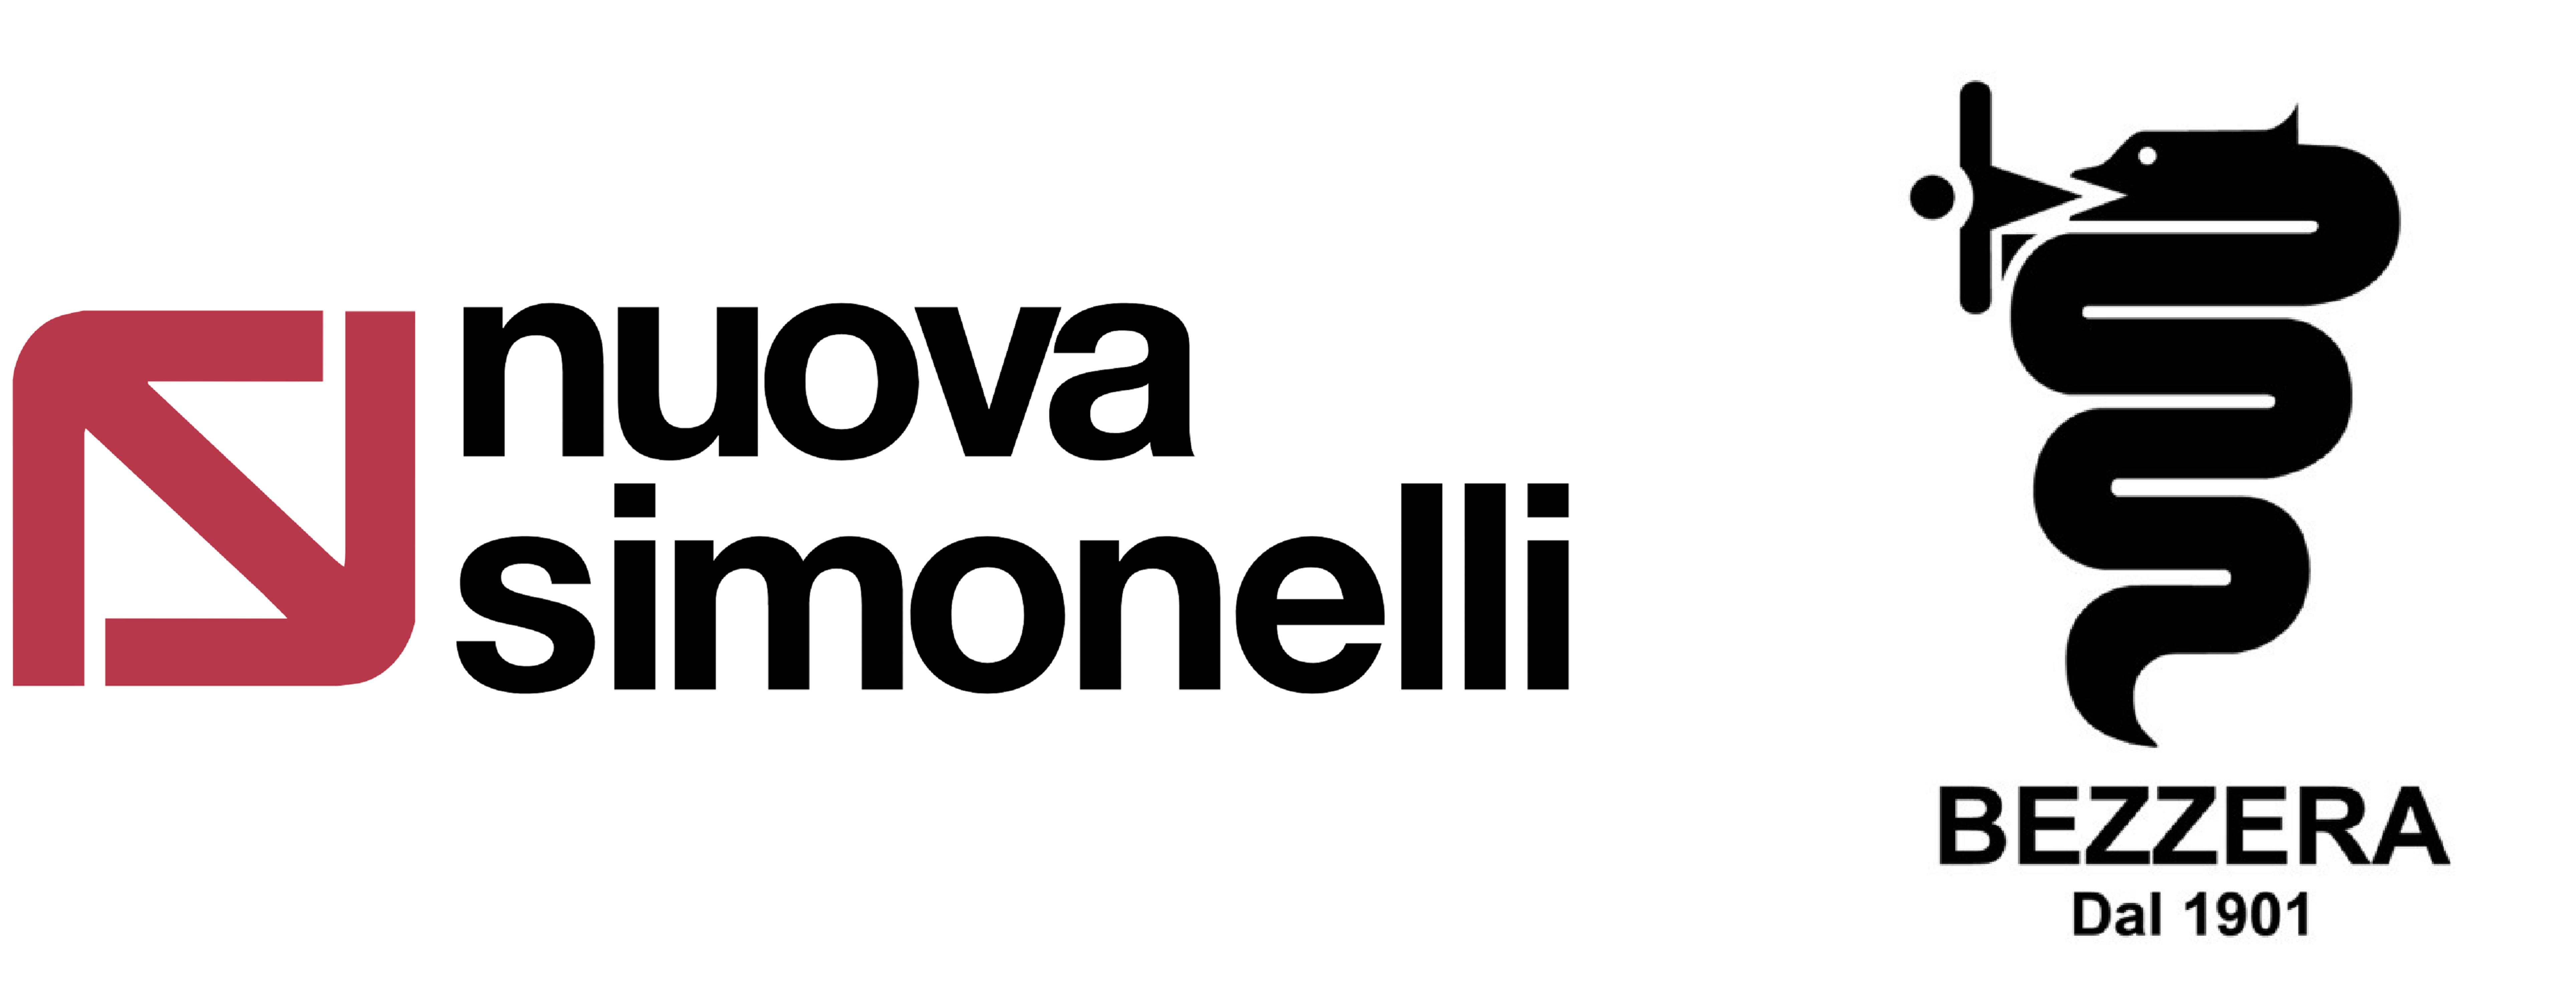 SIMONELLI/BEZZERA